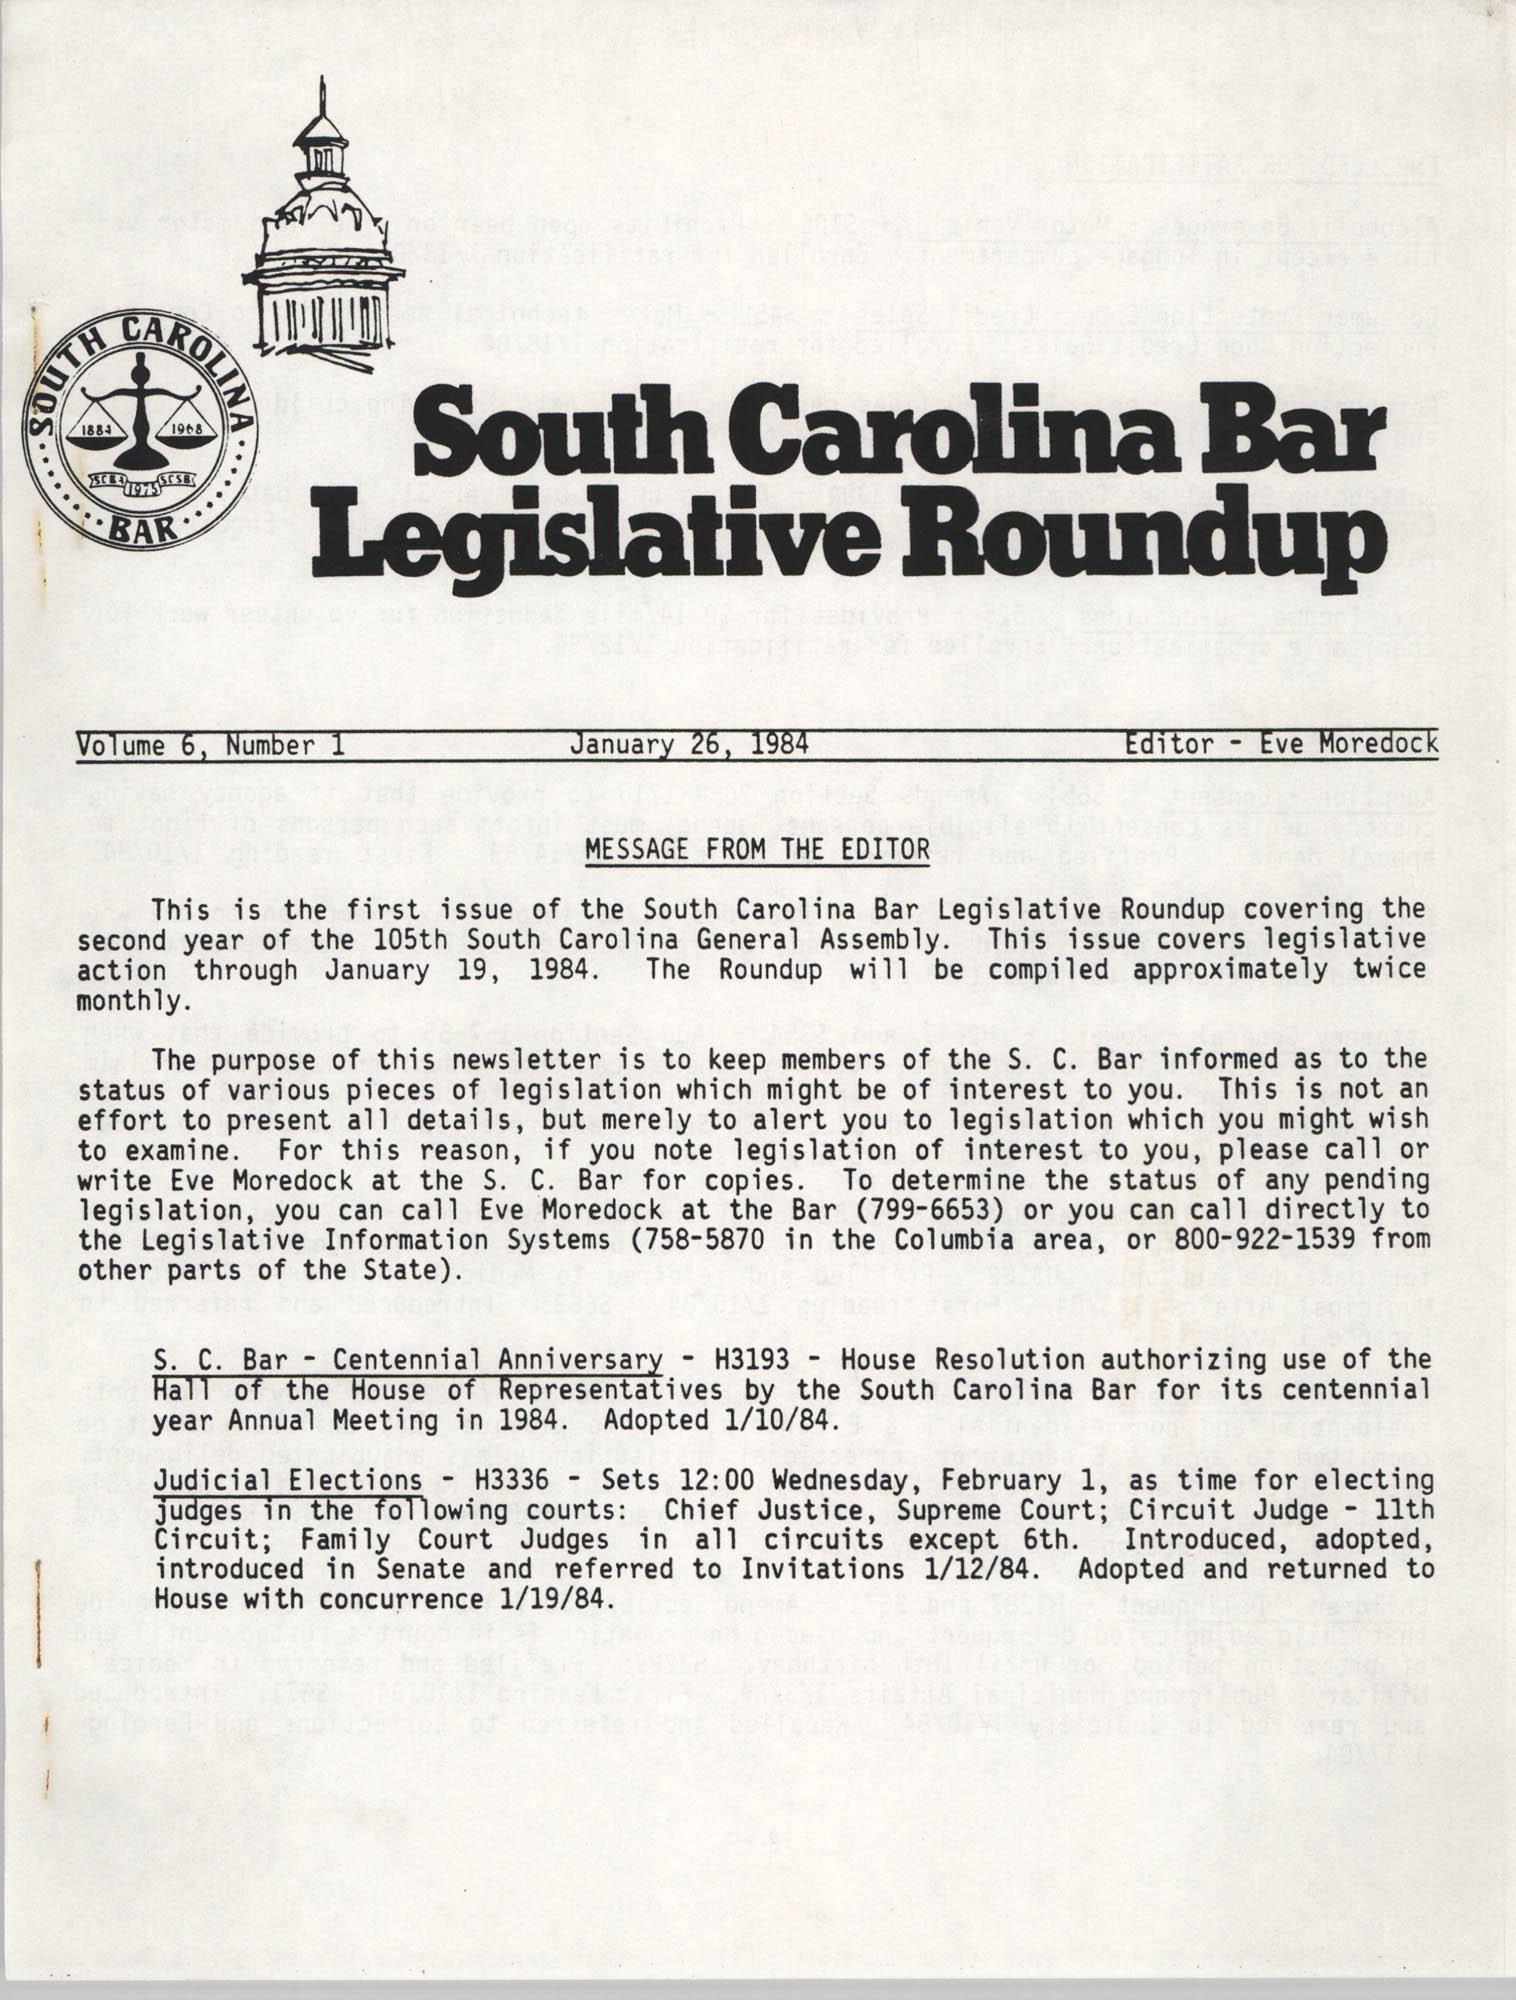 South Carolina Bar Legislative Roundup, Vol. 6 No. 1, January 26, 1984, Page 1